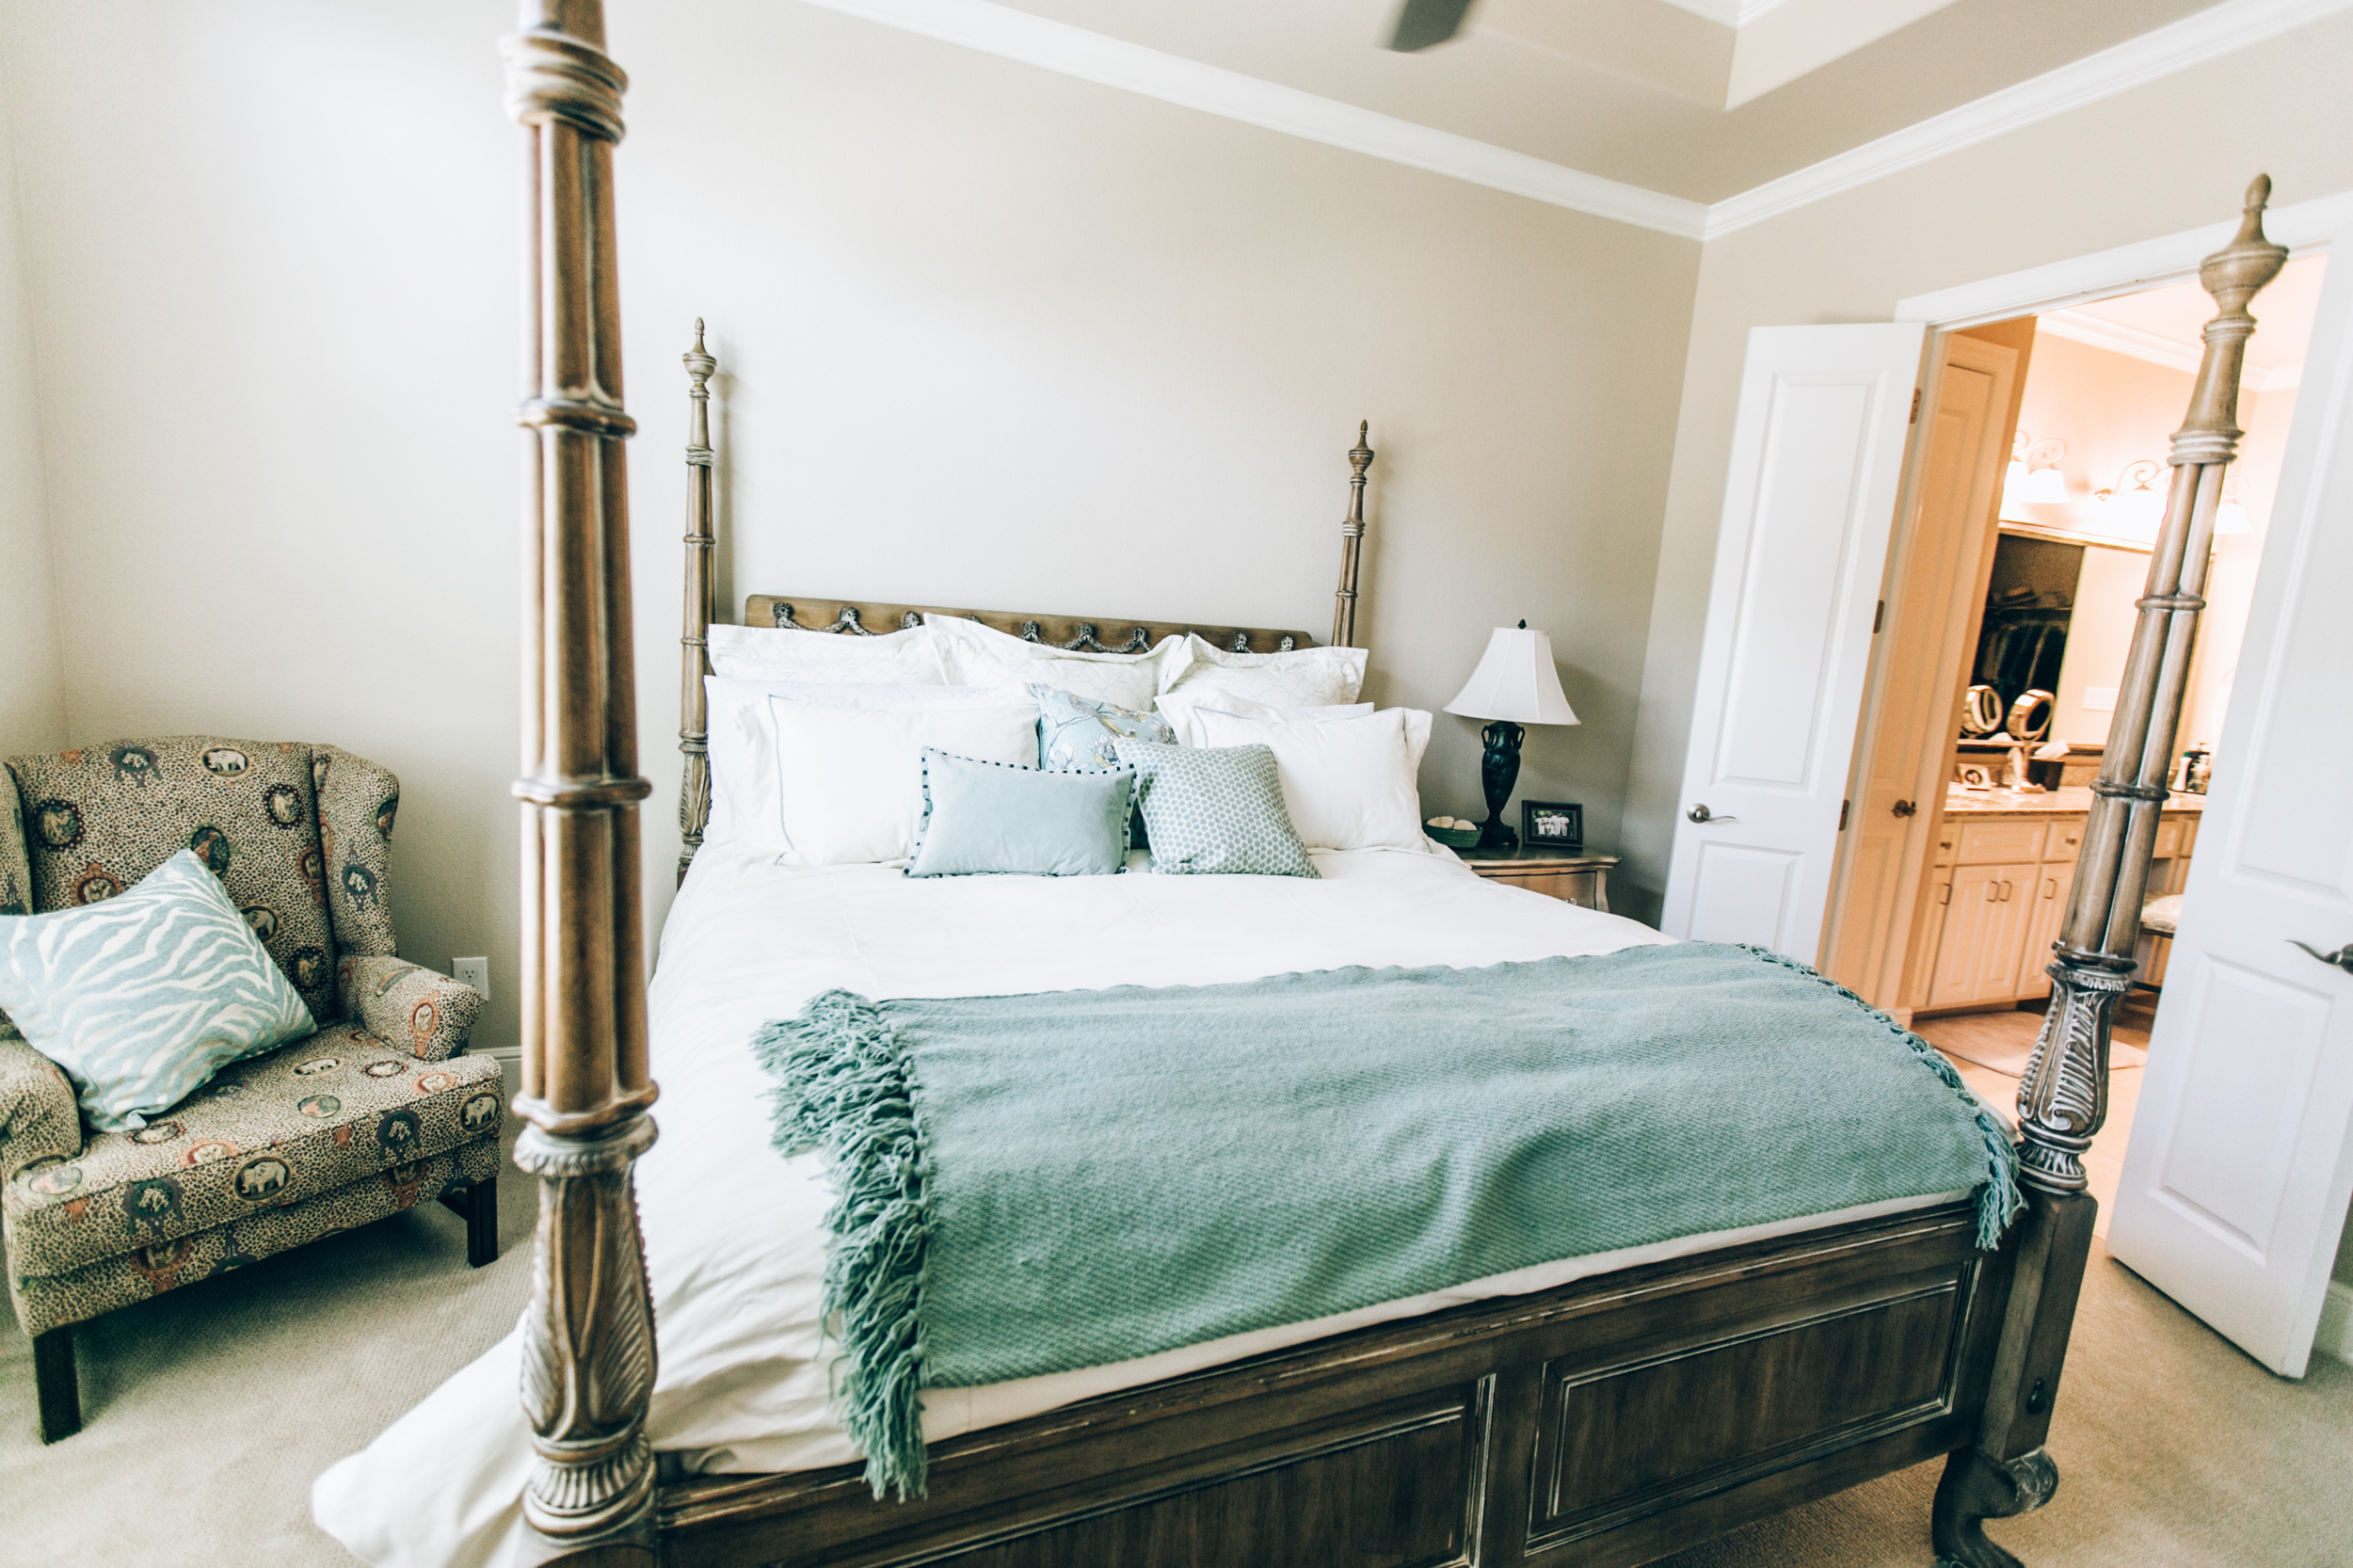 interior-design-home-decorating-350.jpg